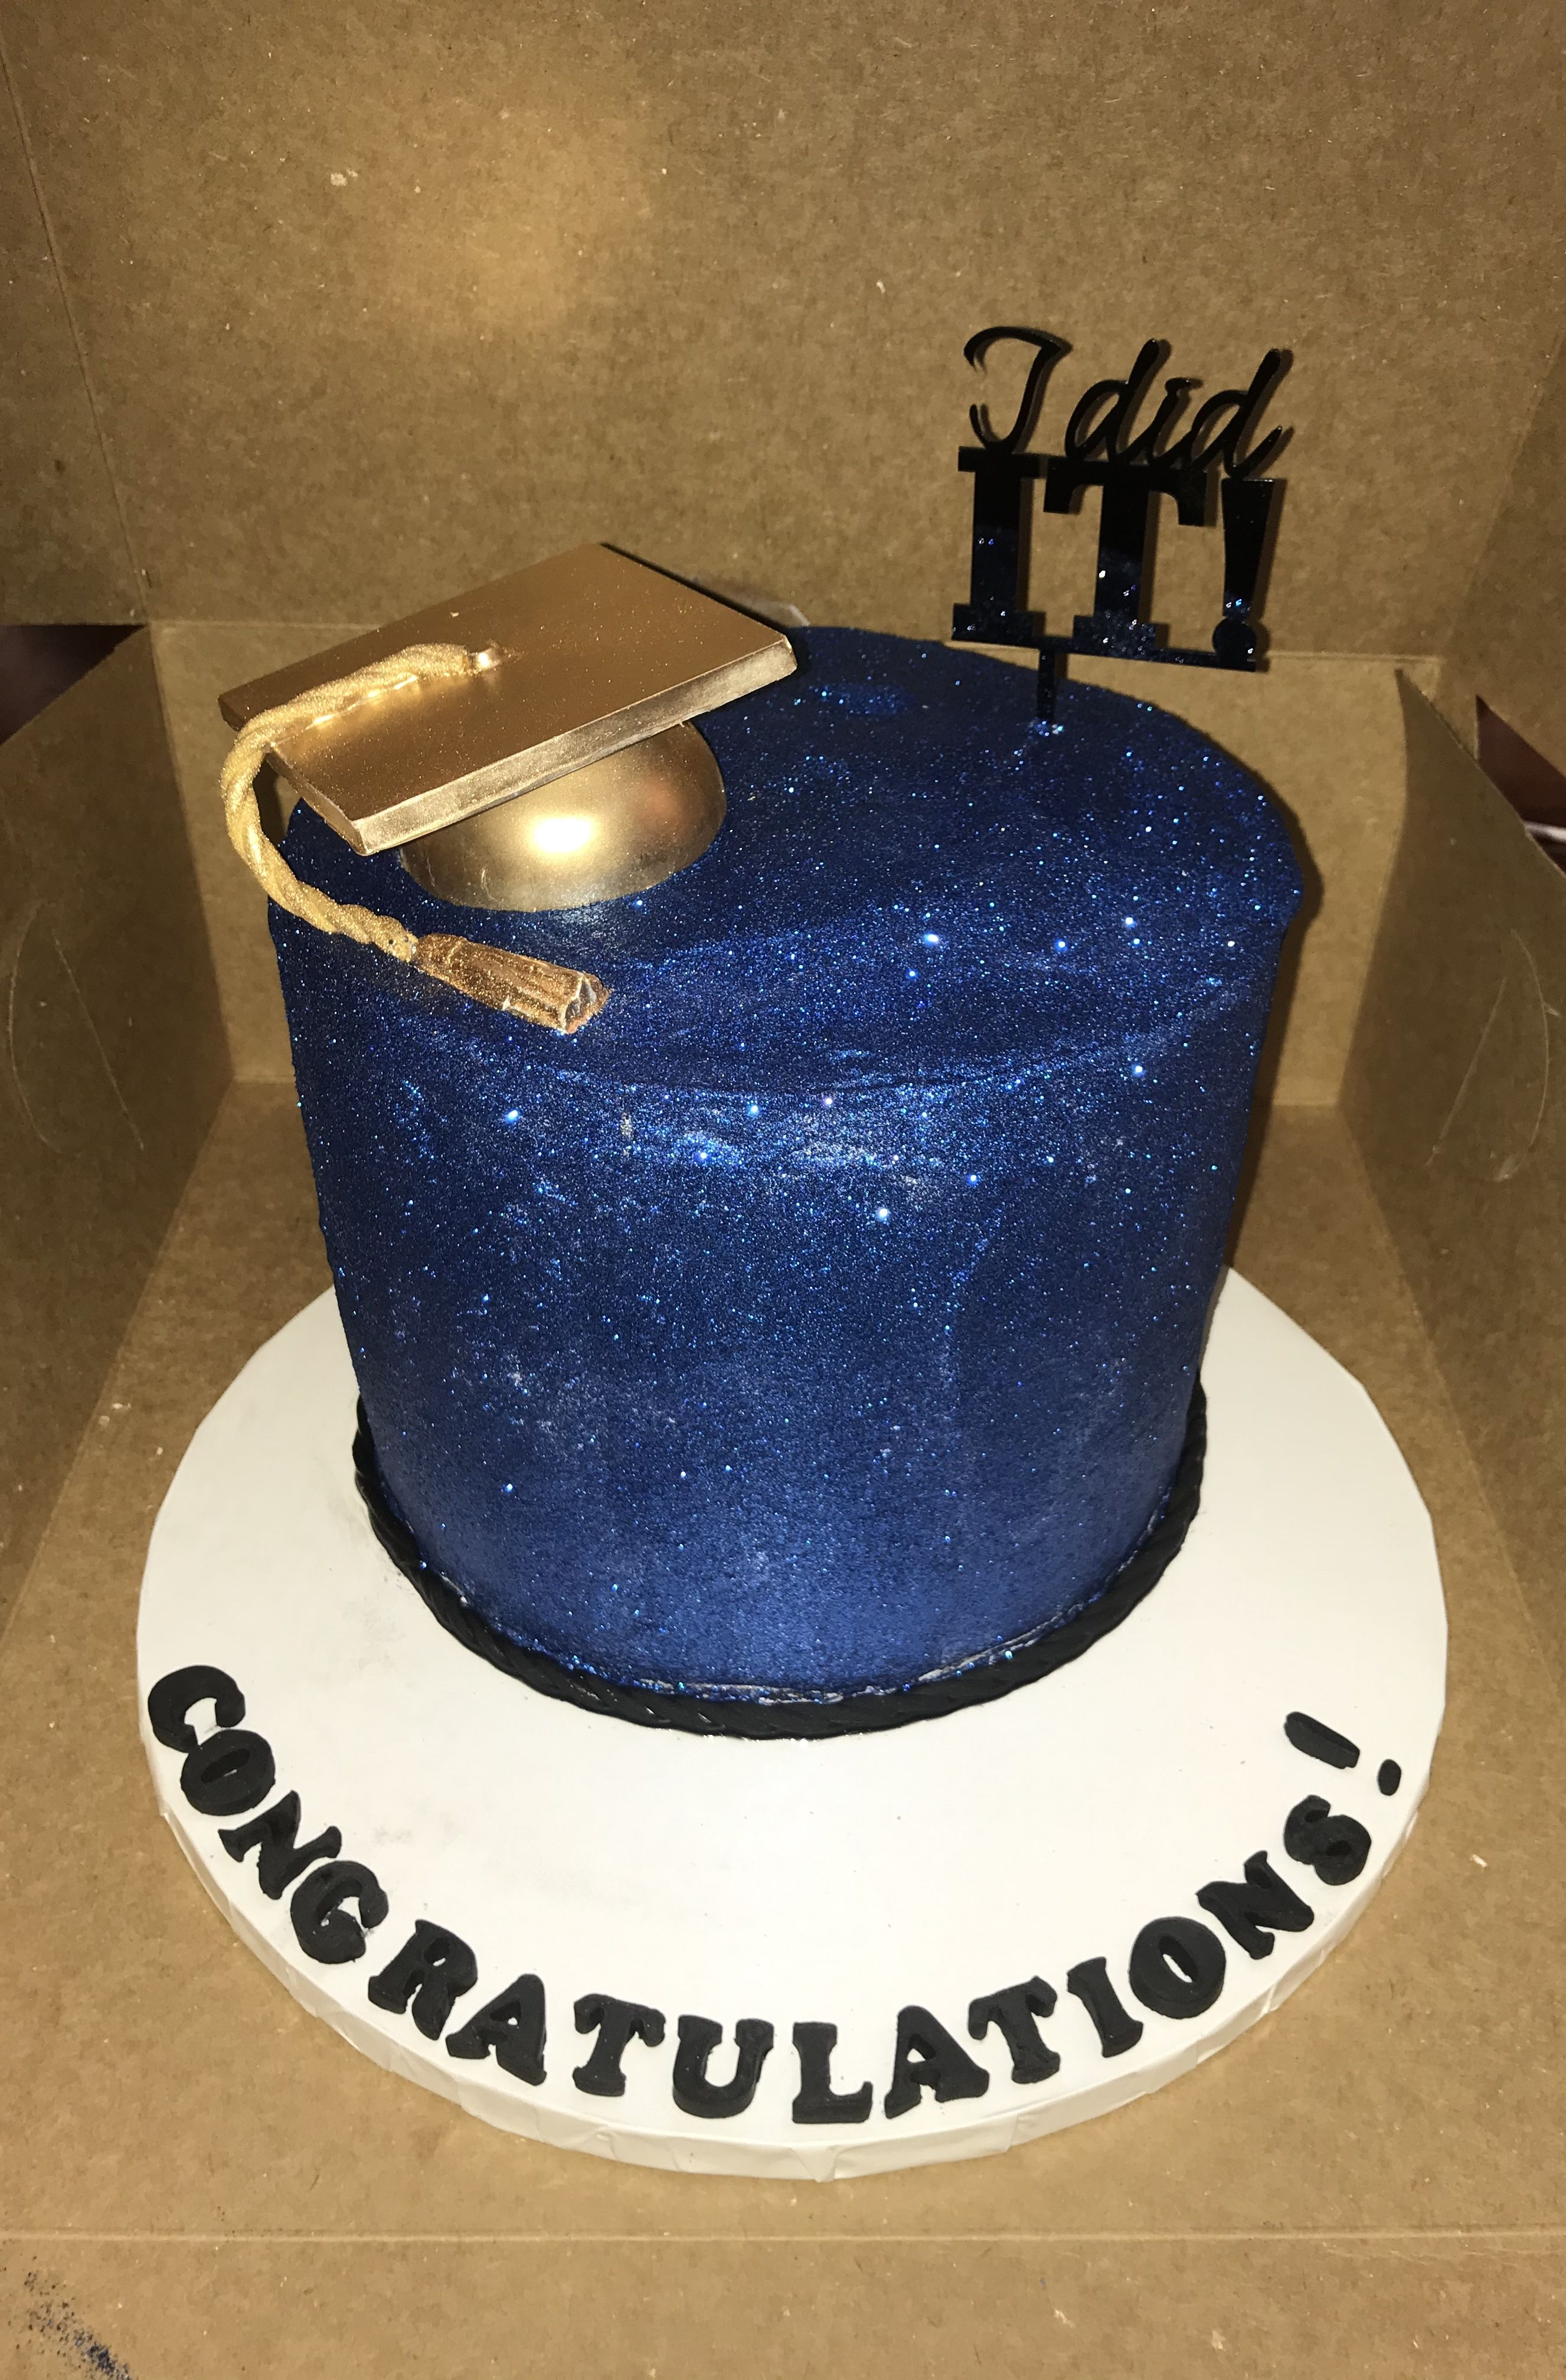 Superb El Cake De Chris In 2020 Cake Birthday Cake Desserts Personalised Birthday Cards Sponlily Jamesorg